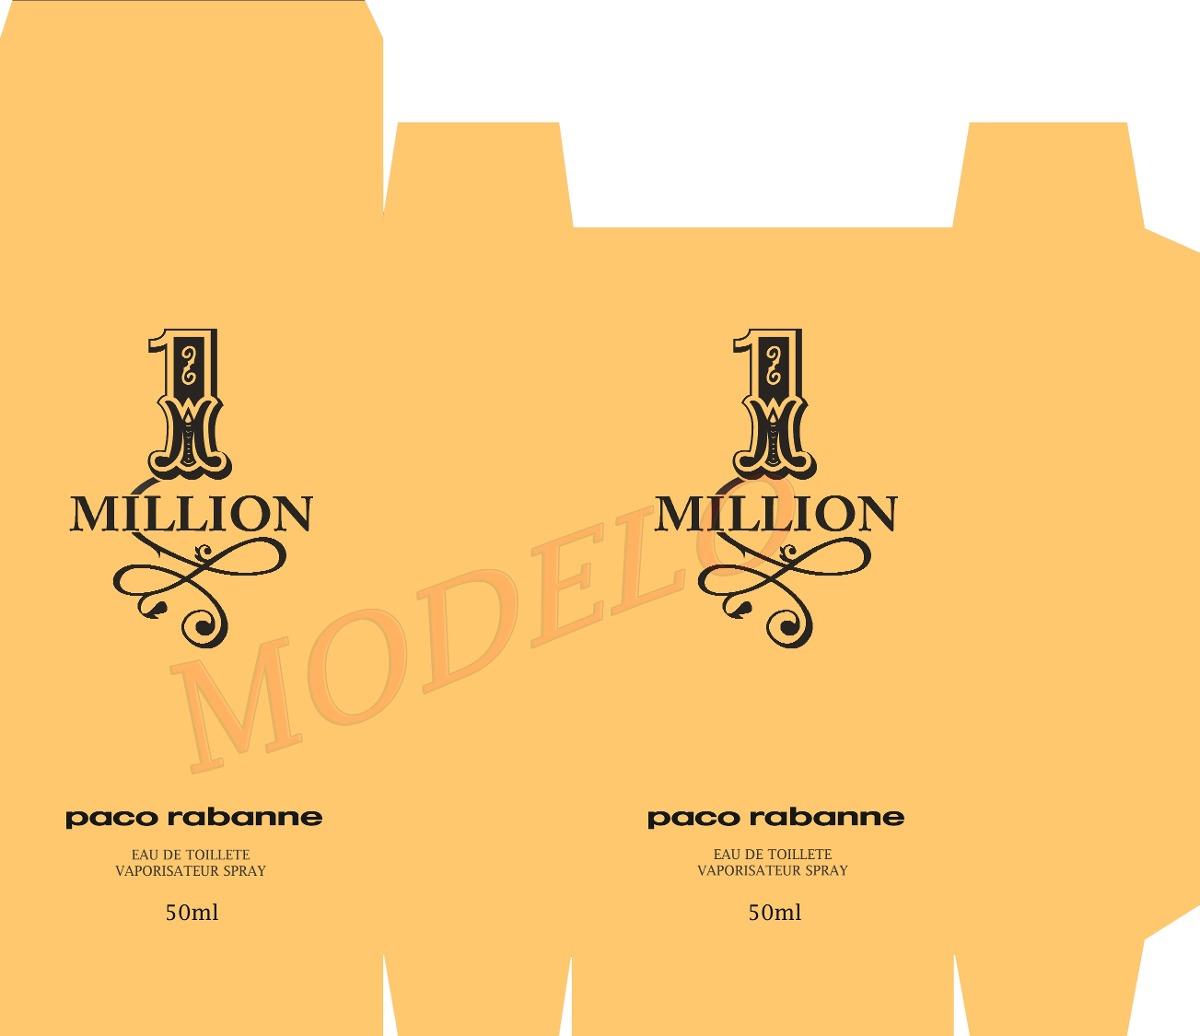 Arte Das Caixas Para Perfumes Importados Contra Tipo Etc... - R  10 ... ee48ac6be488a